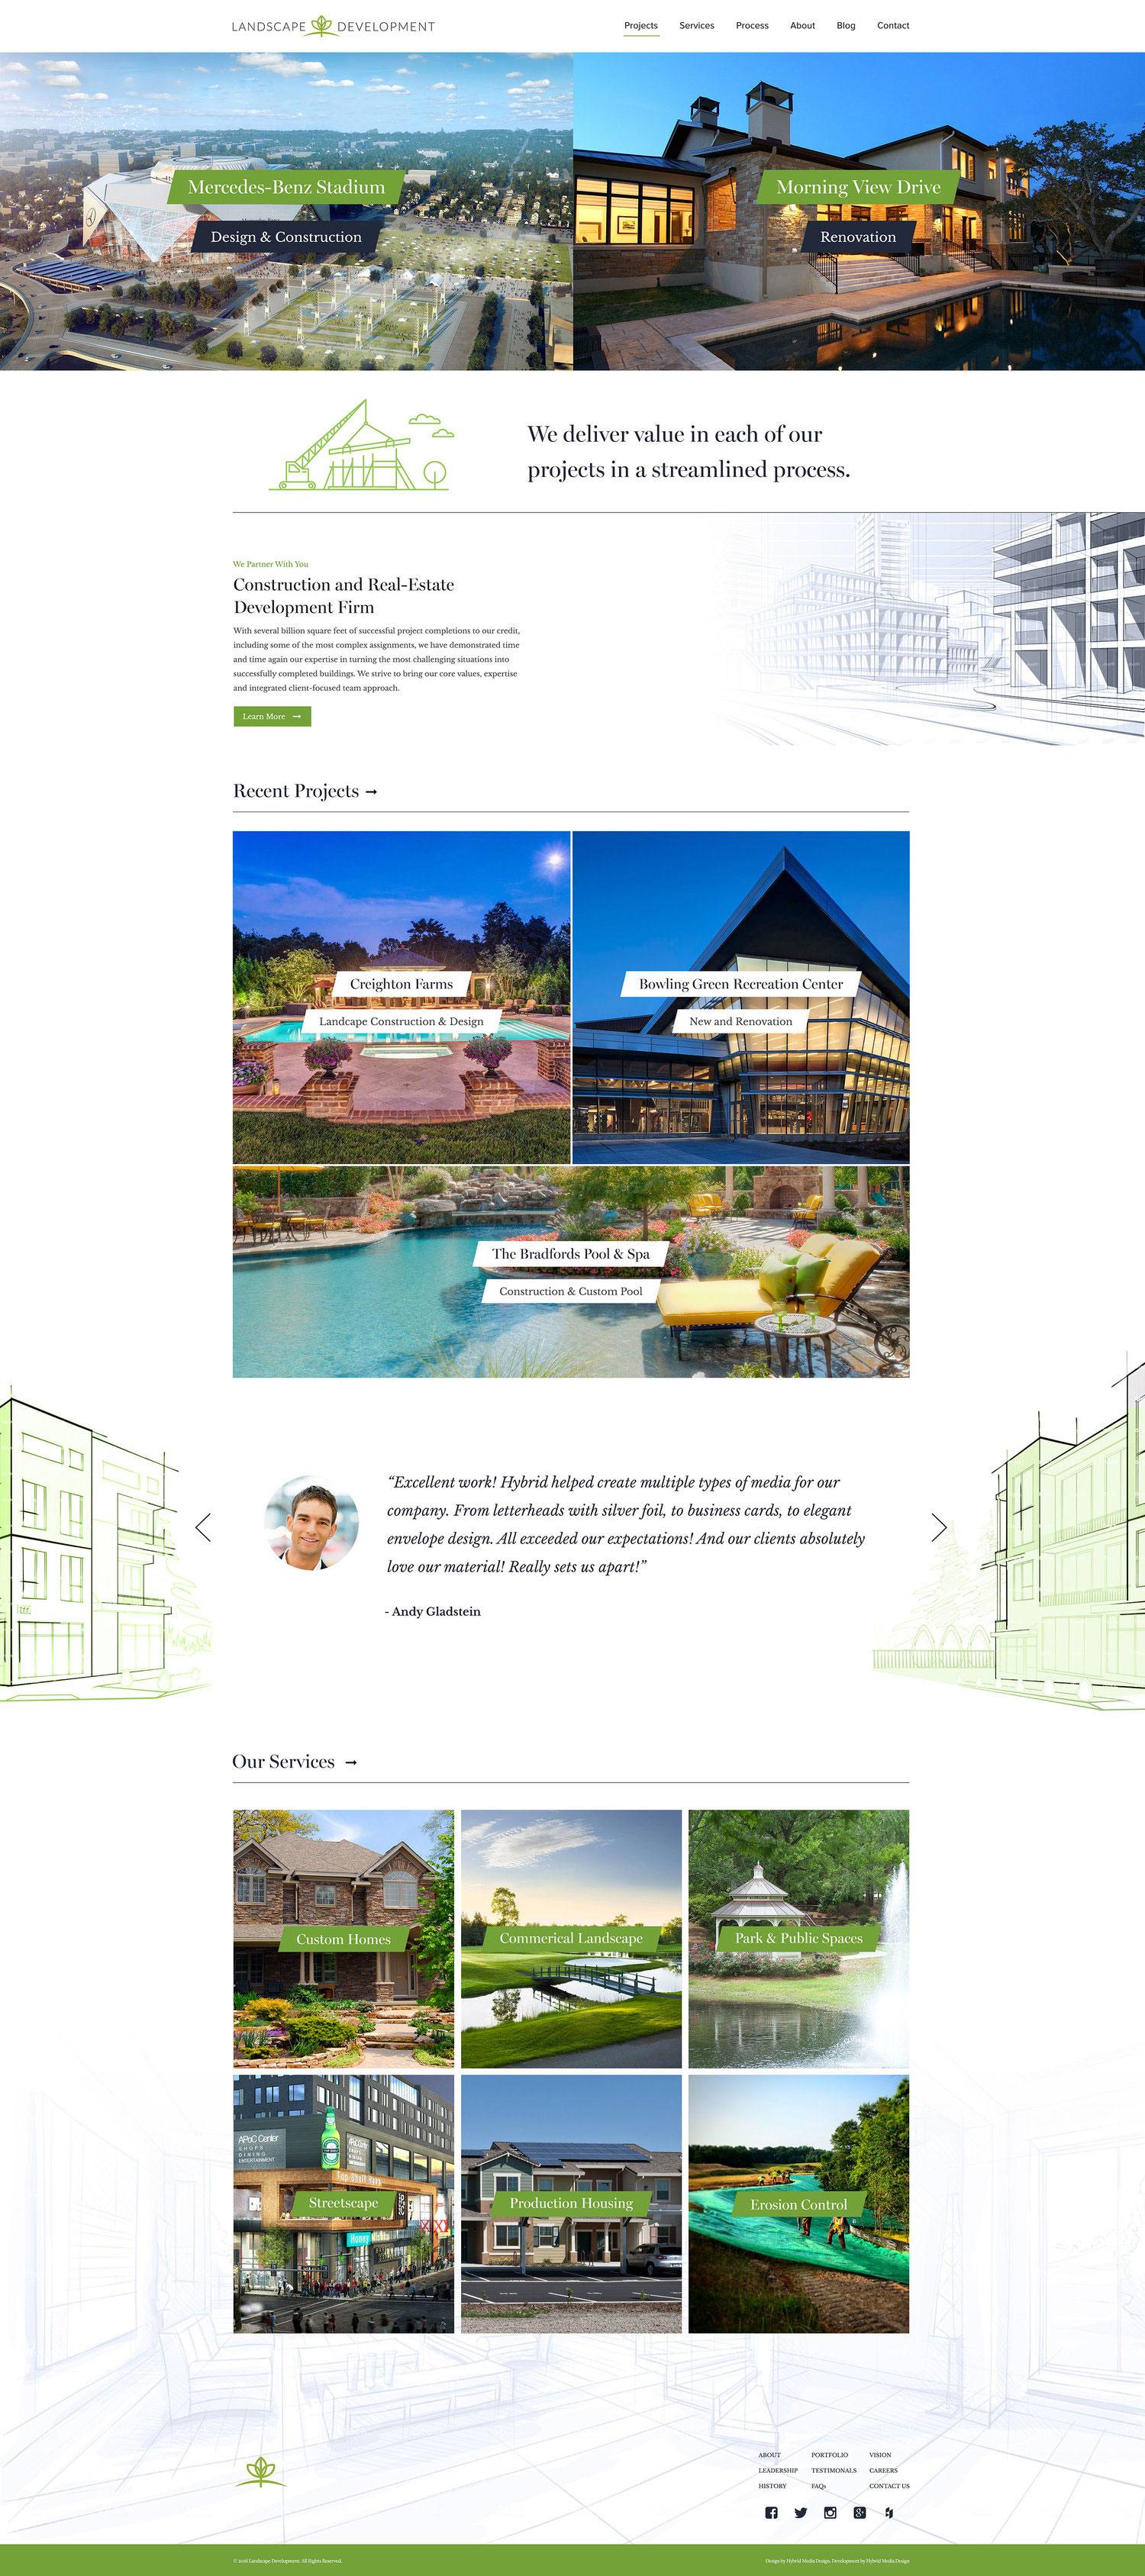 Web Design | Landscape Development - Homepage (Desktop View)